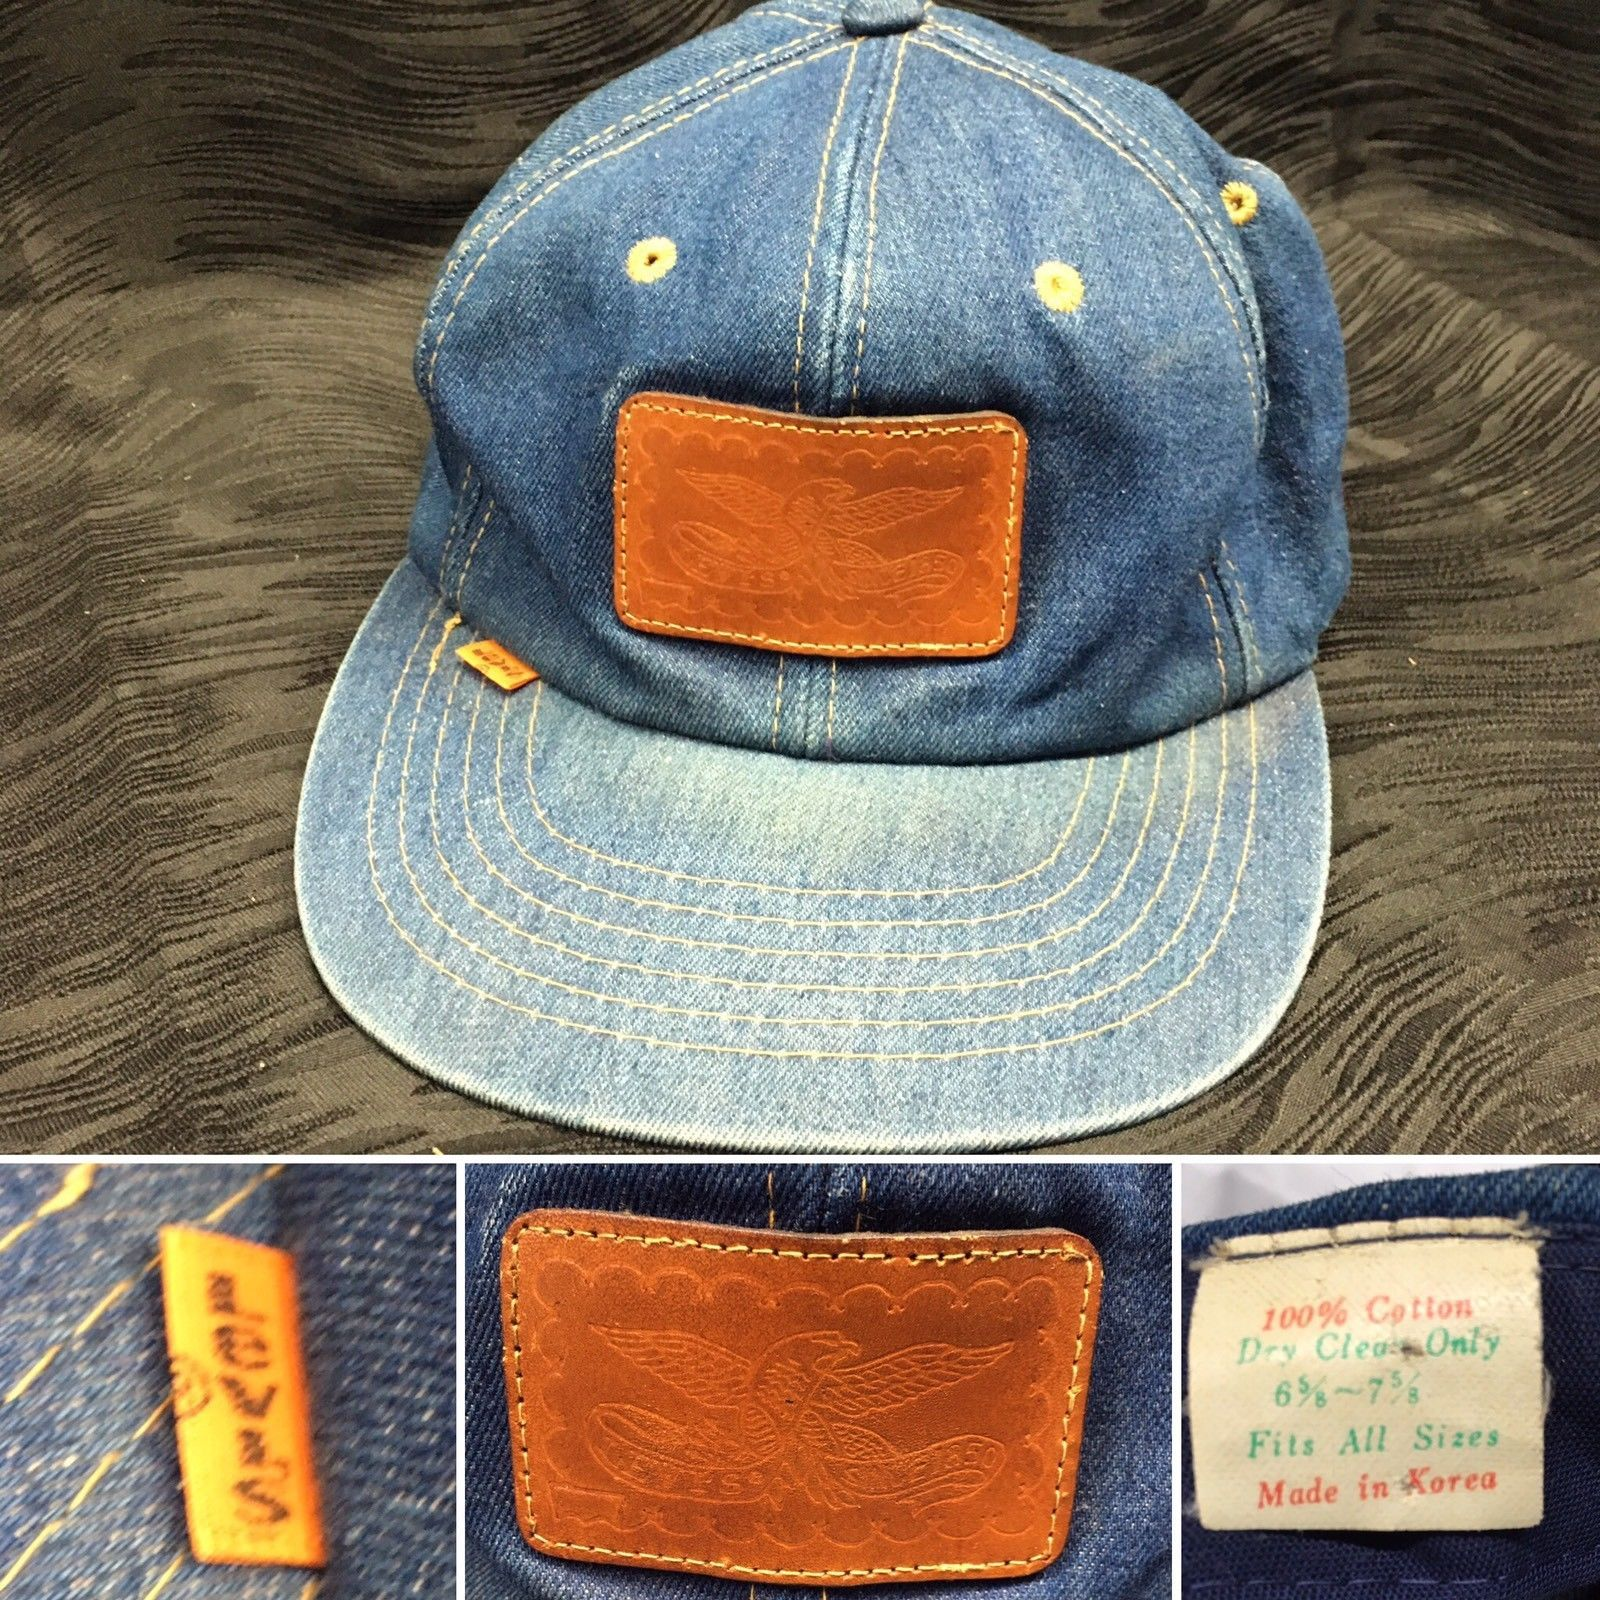 71f3cd8b7 Details about Vtg Levi Strauss Denim Leather Patch Snapback Orange ...